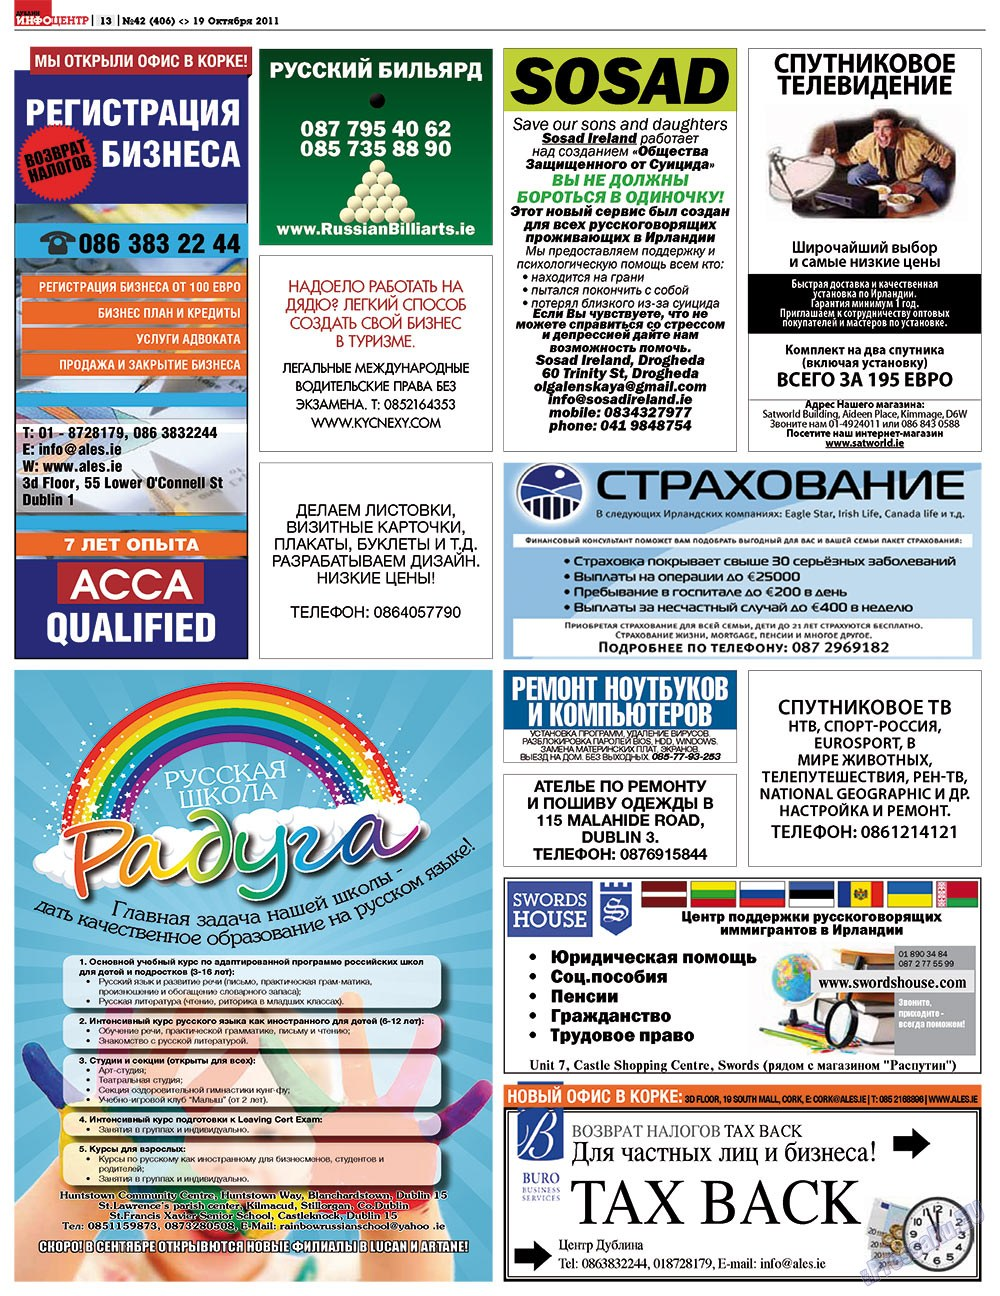 Дублин инфоцентр (газета). 2011 год, номер 42, стр. 13